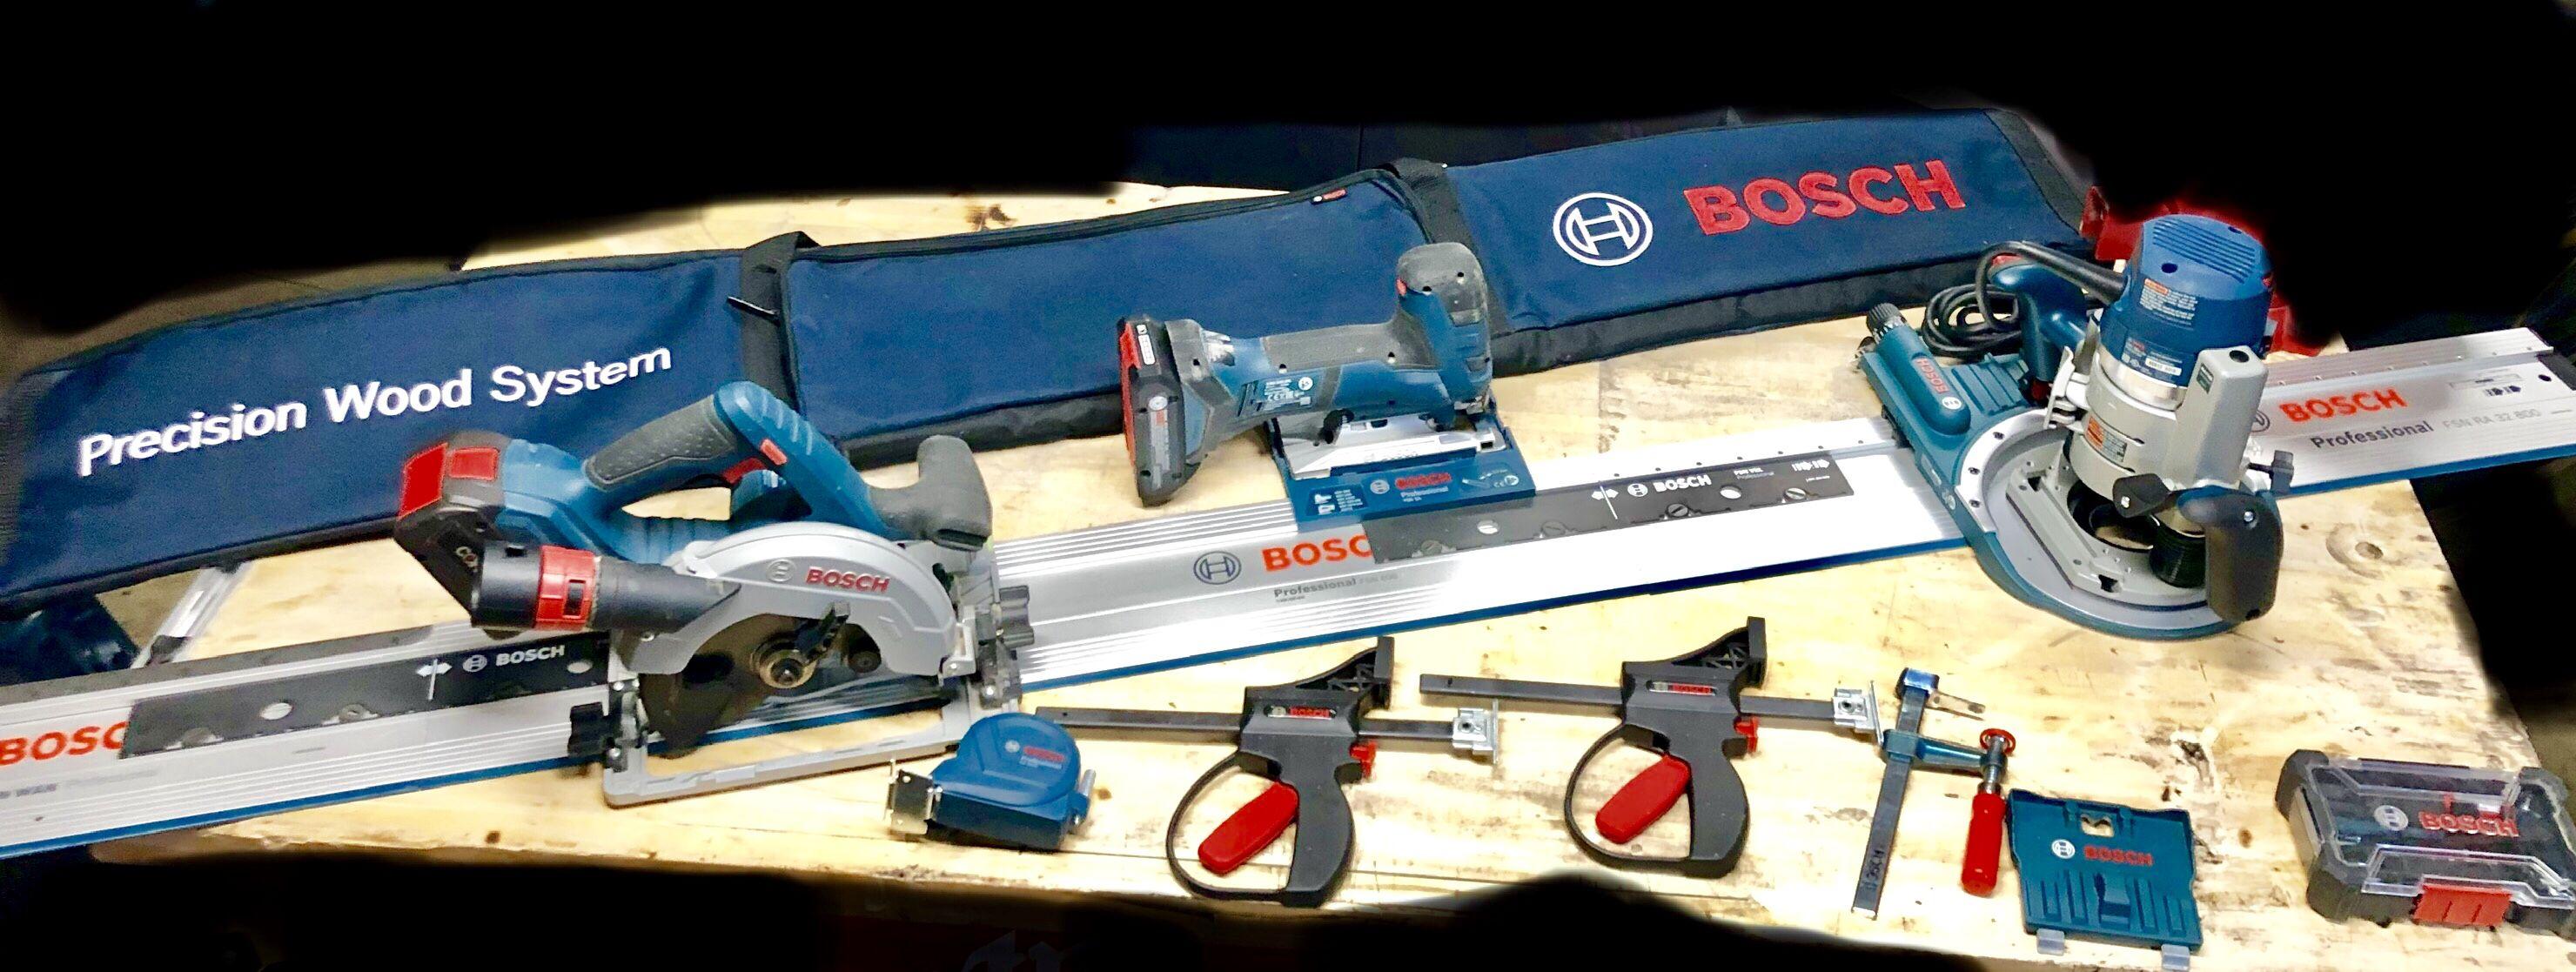 Bosch Fsn Guide Rail System Bosch Tools Bosch Tools